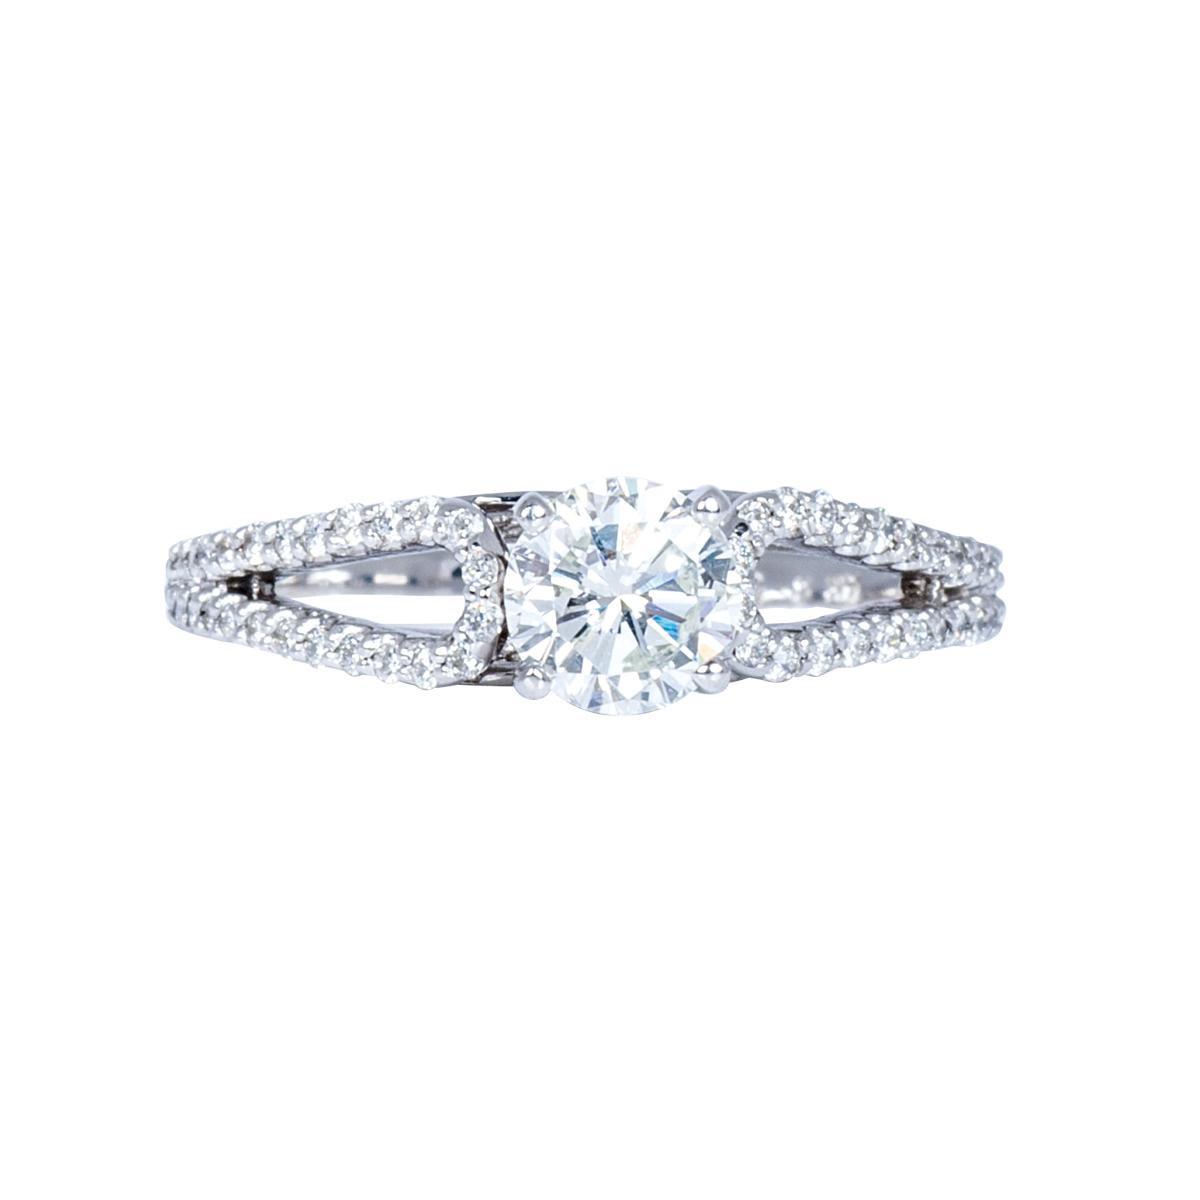 New 14k White Gold 0.92 CTW Engagement Ring